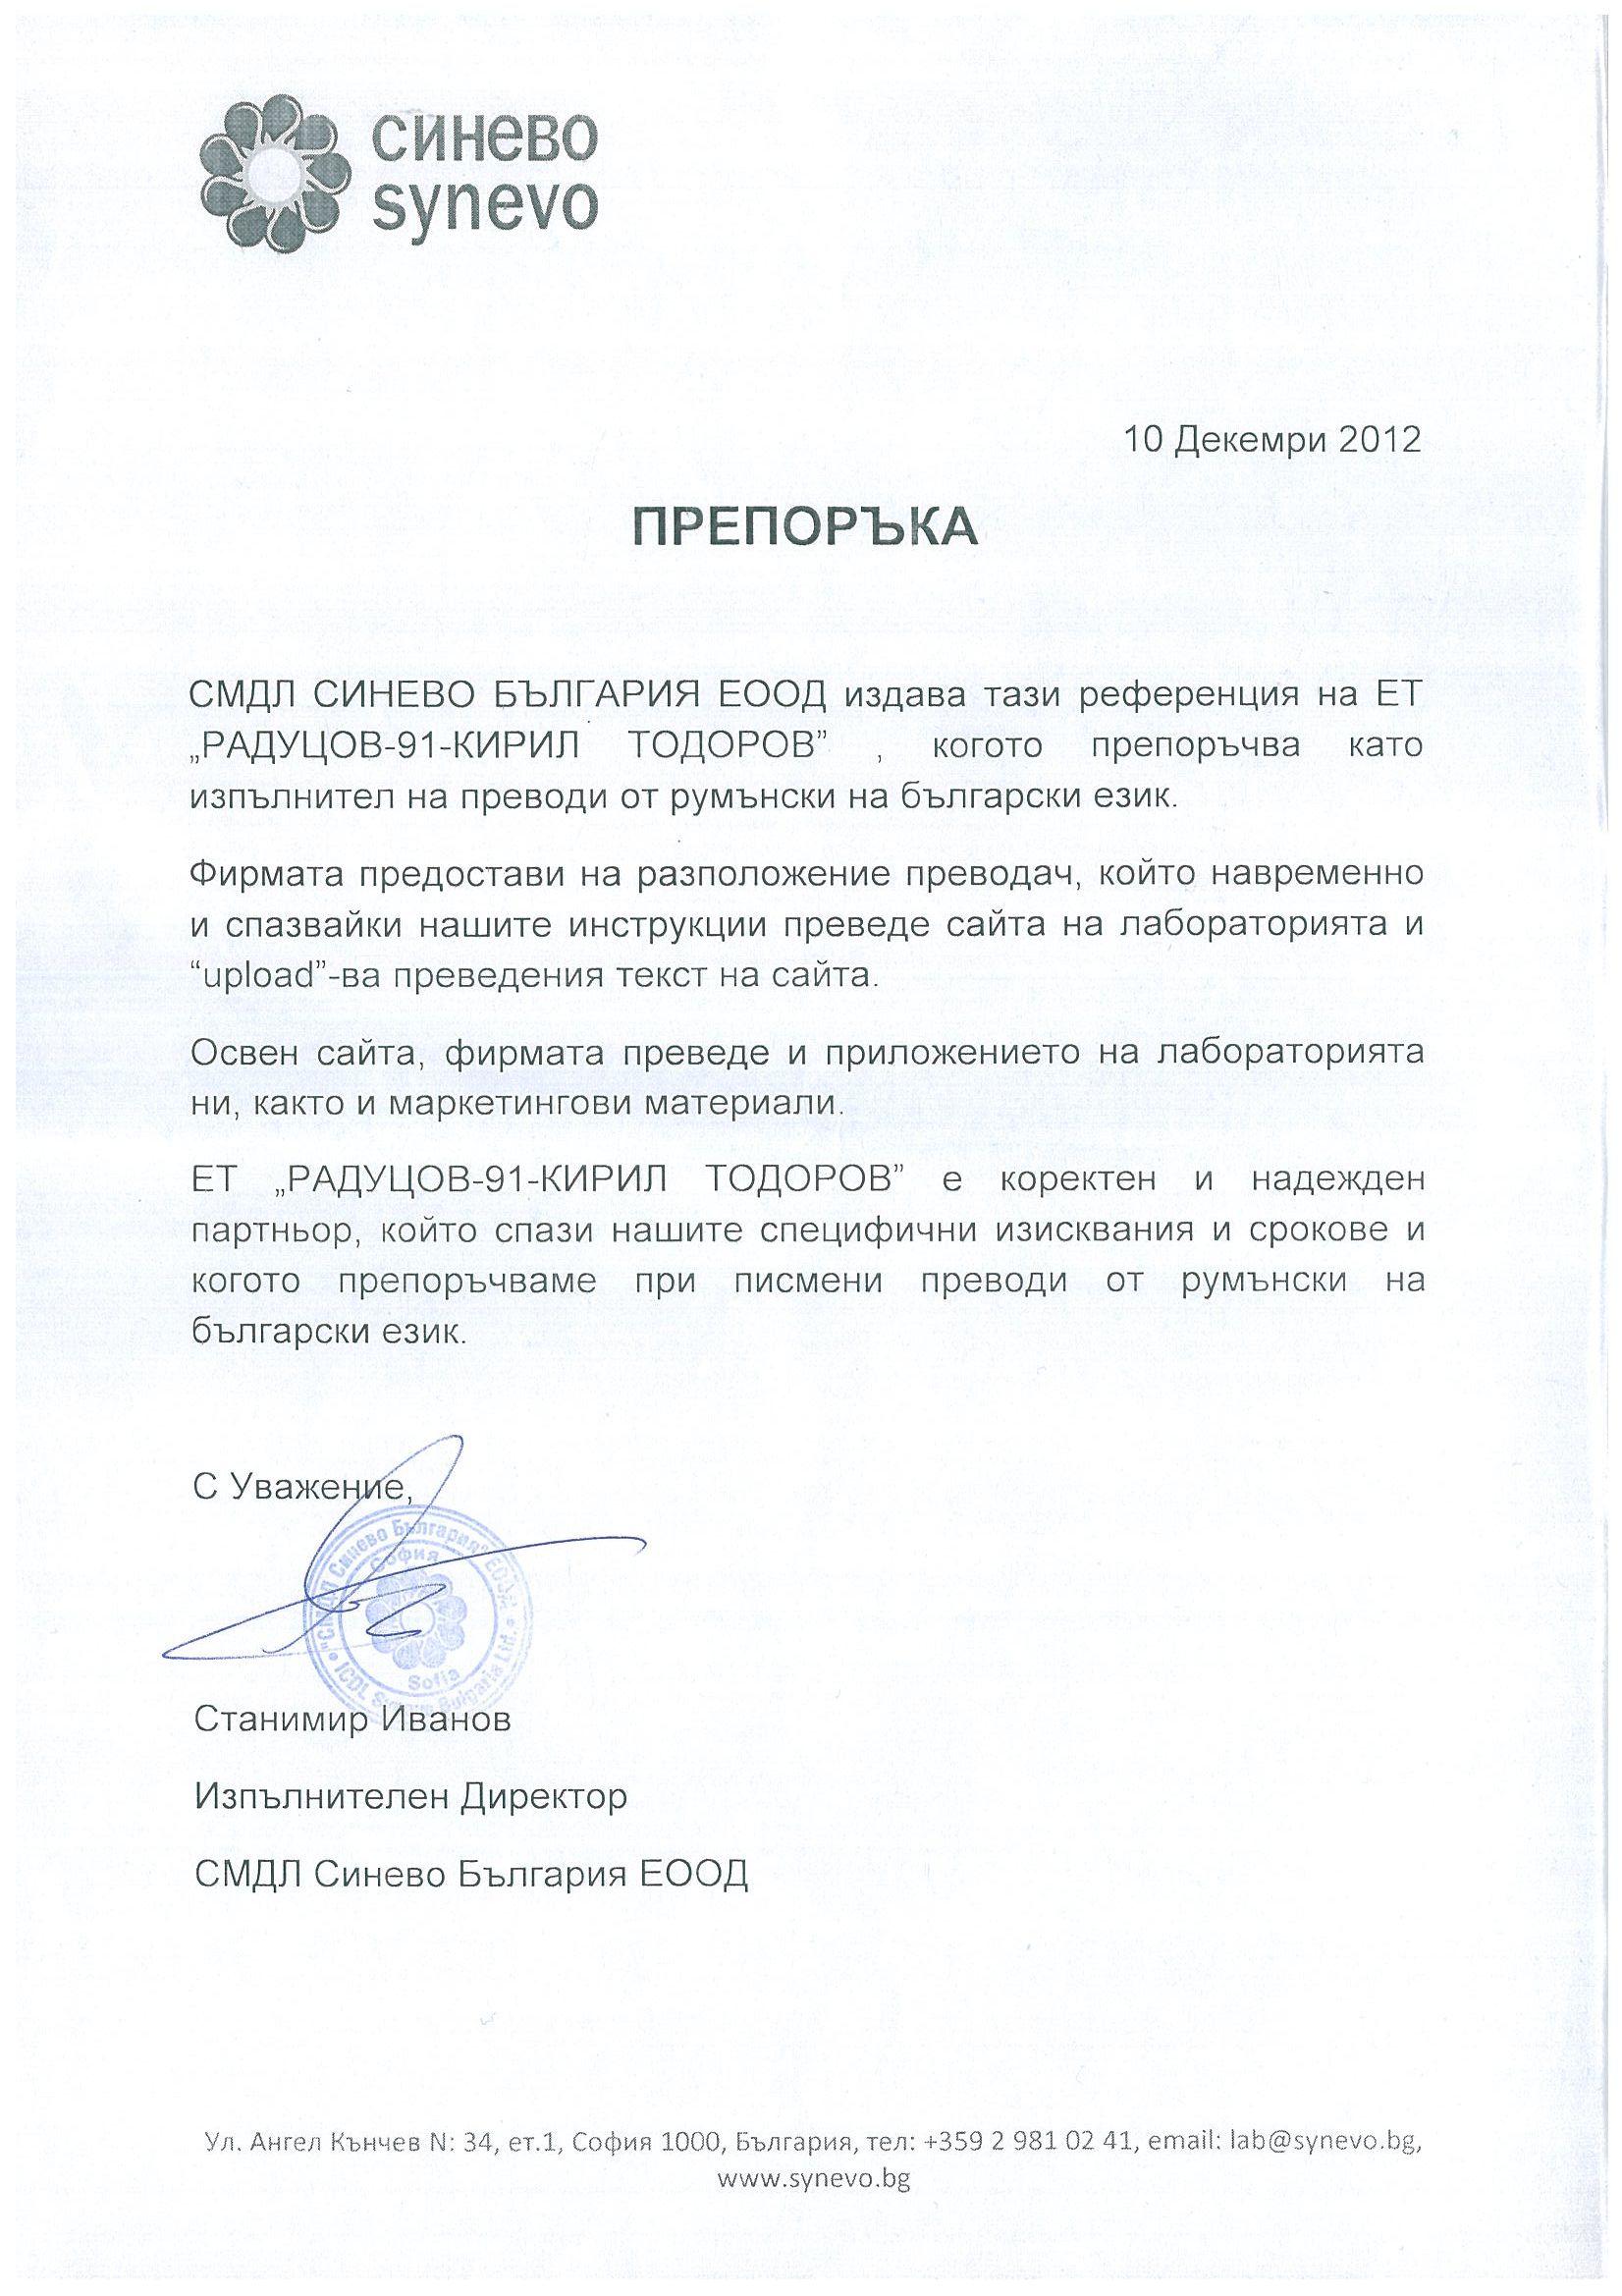 3_Preporyka_Synevo